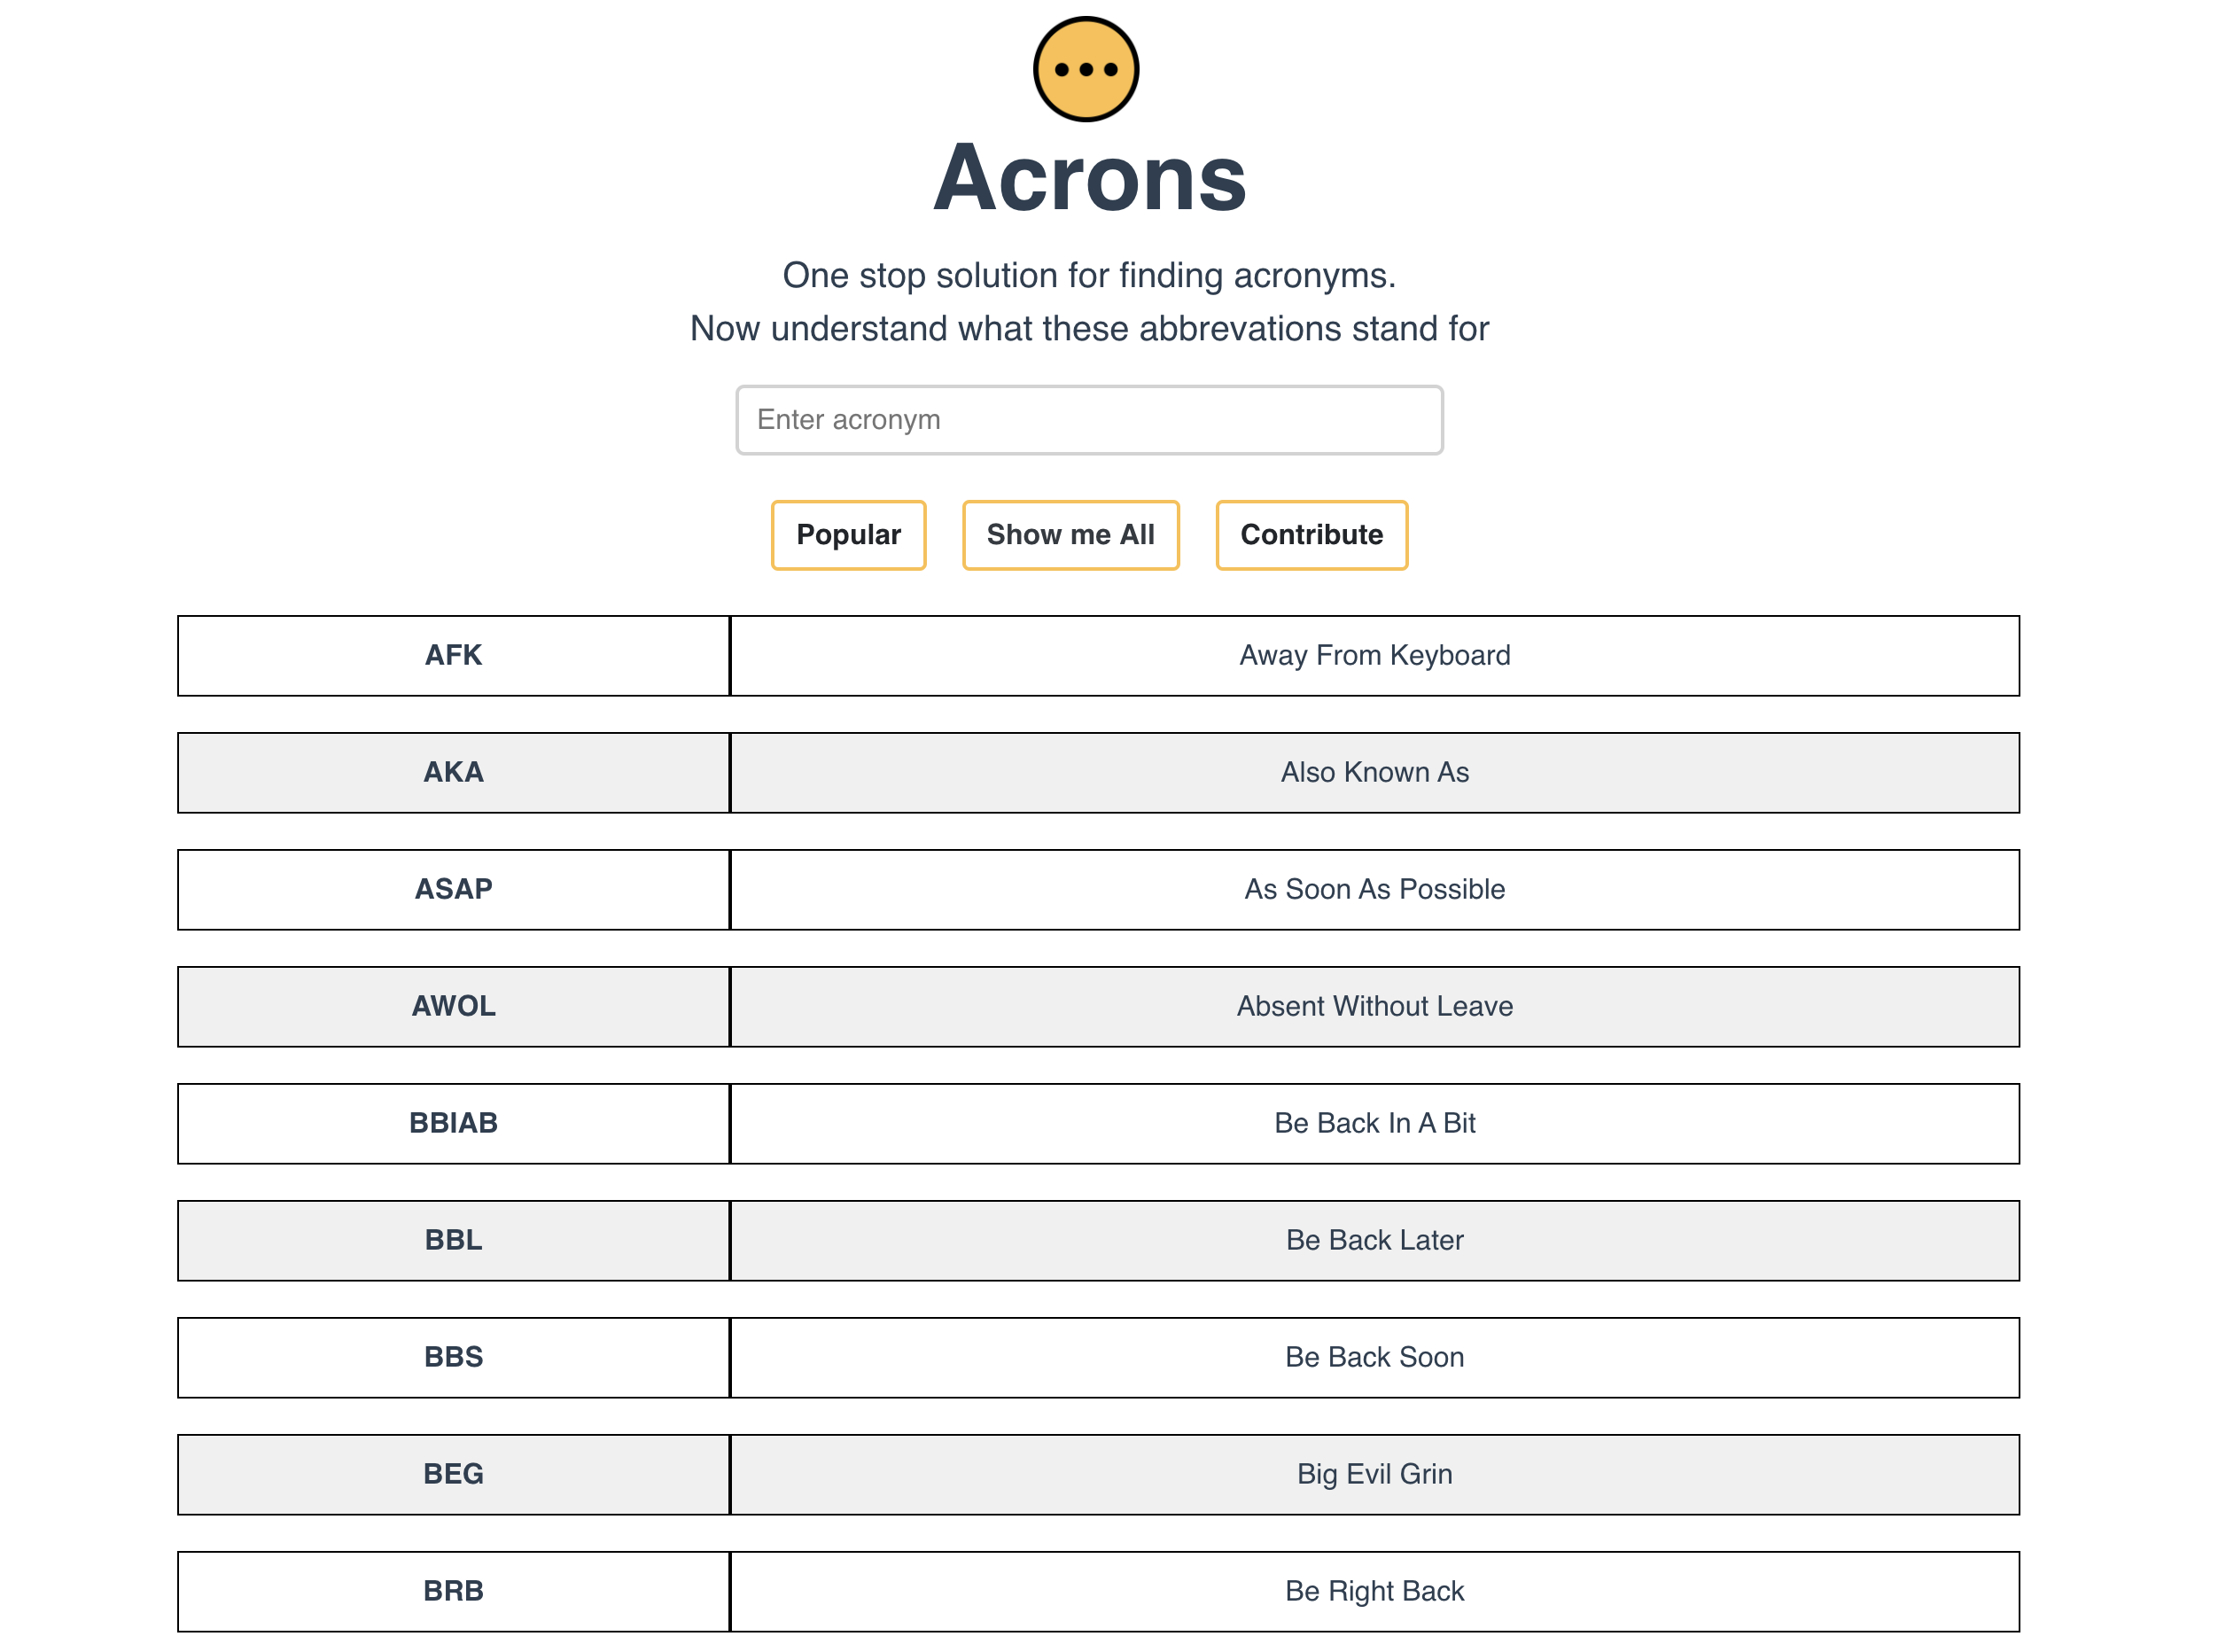 Acrons